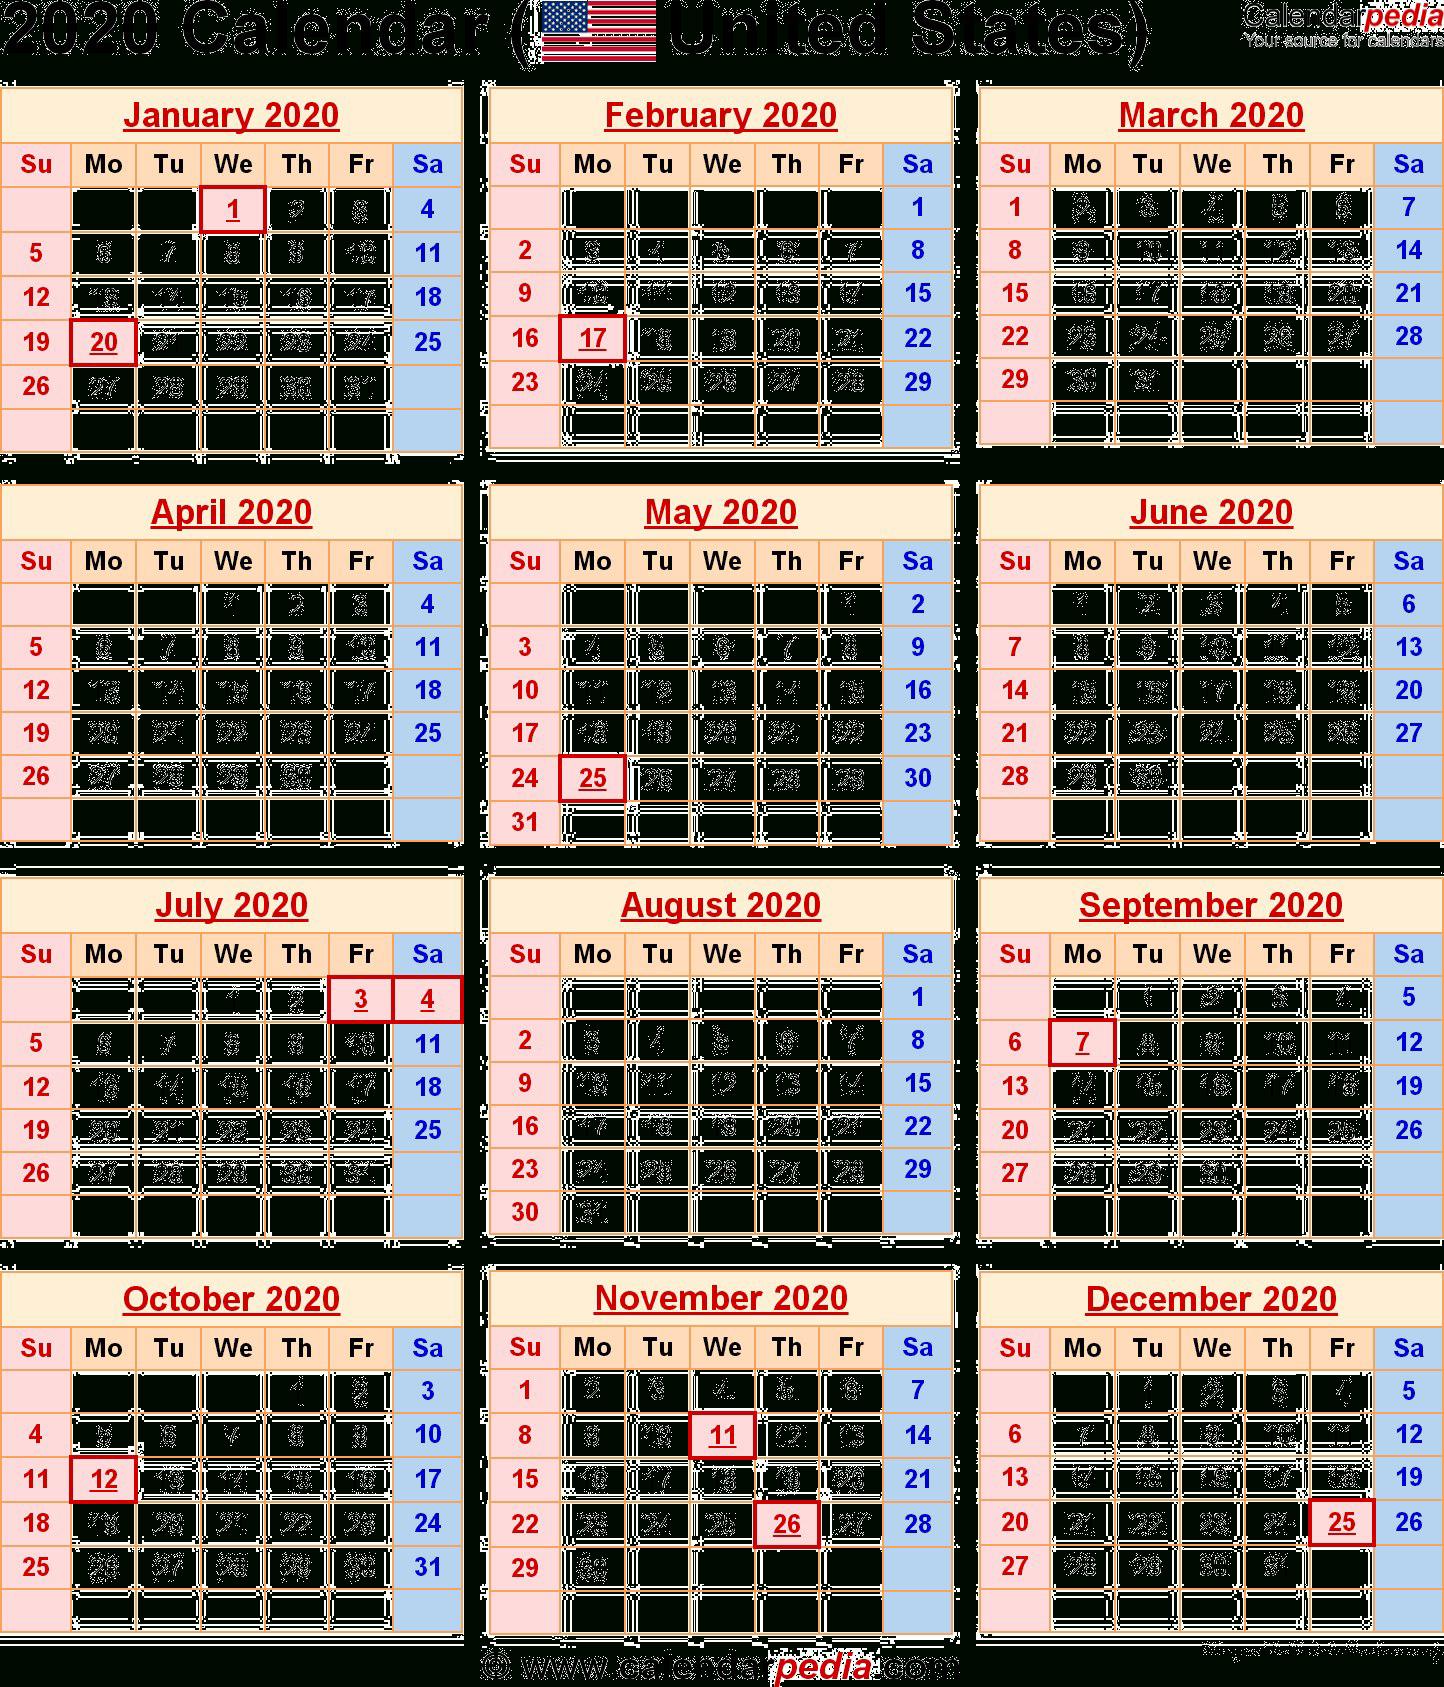 2020 Calendar Png Transparent Images | Png All with regard to Govt Of Bihar Calendar 2020